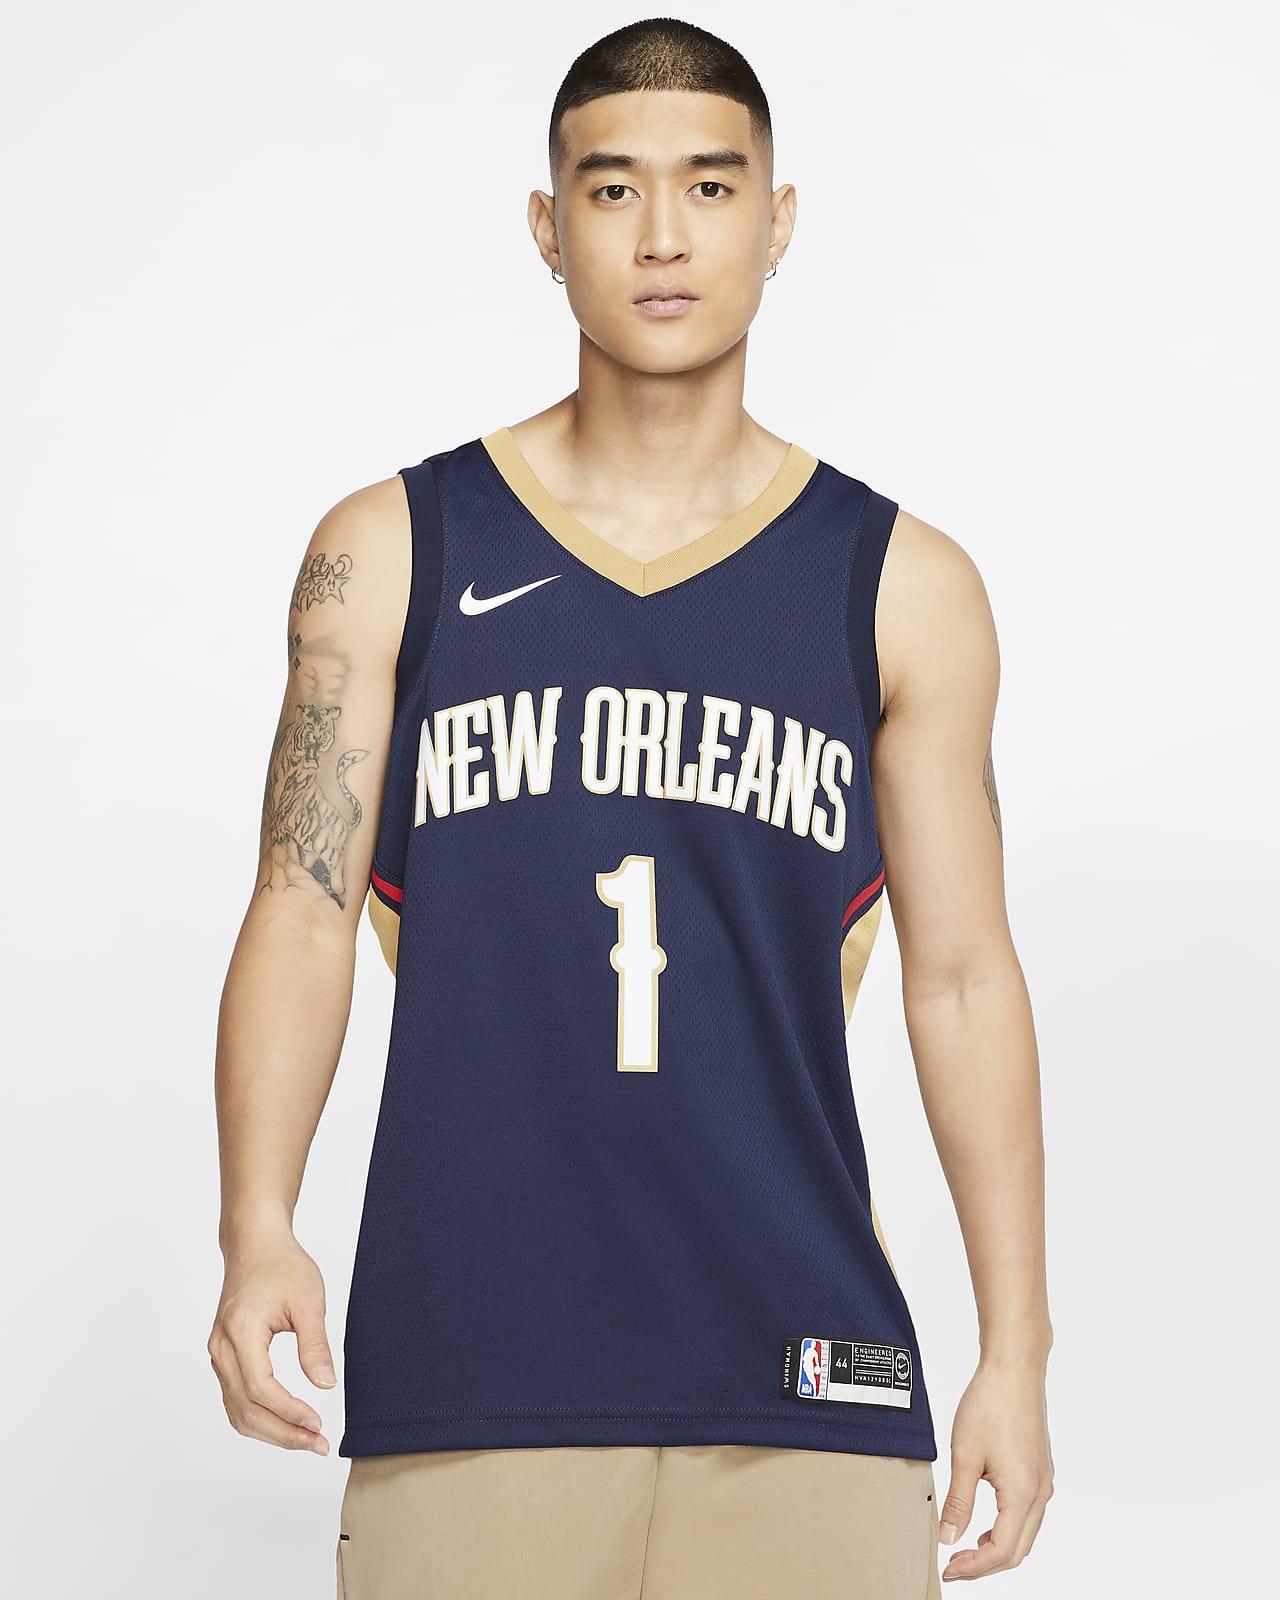 Camisola NBA da Nike Swingman Zion Williamson Pelicans Icon Edition para homem